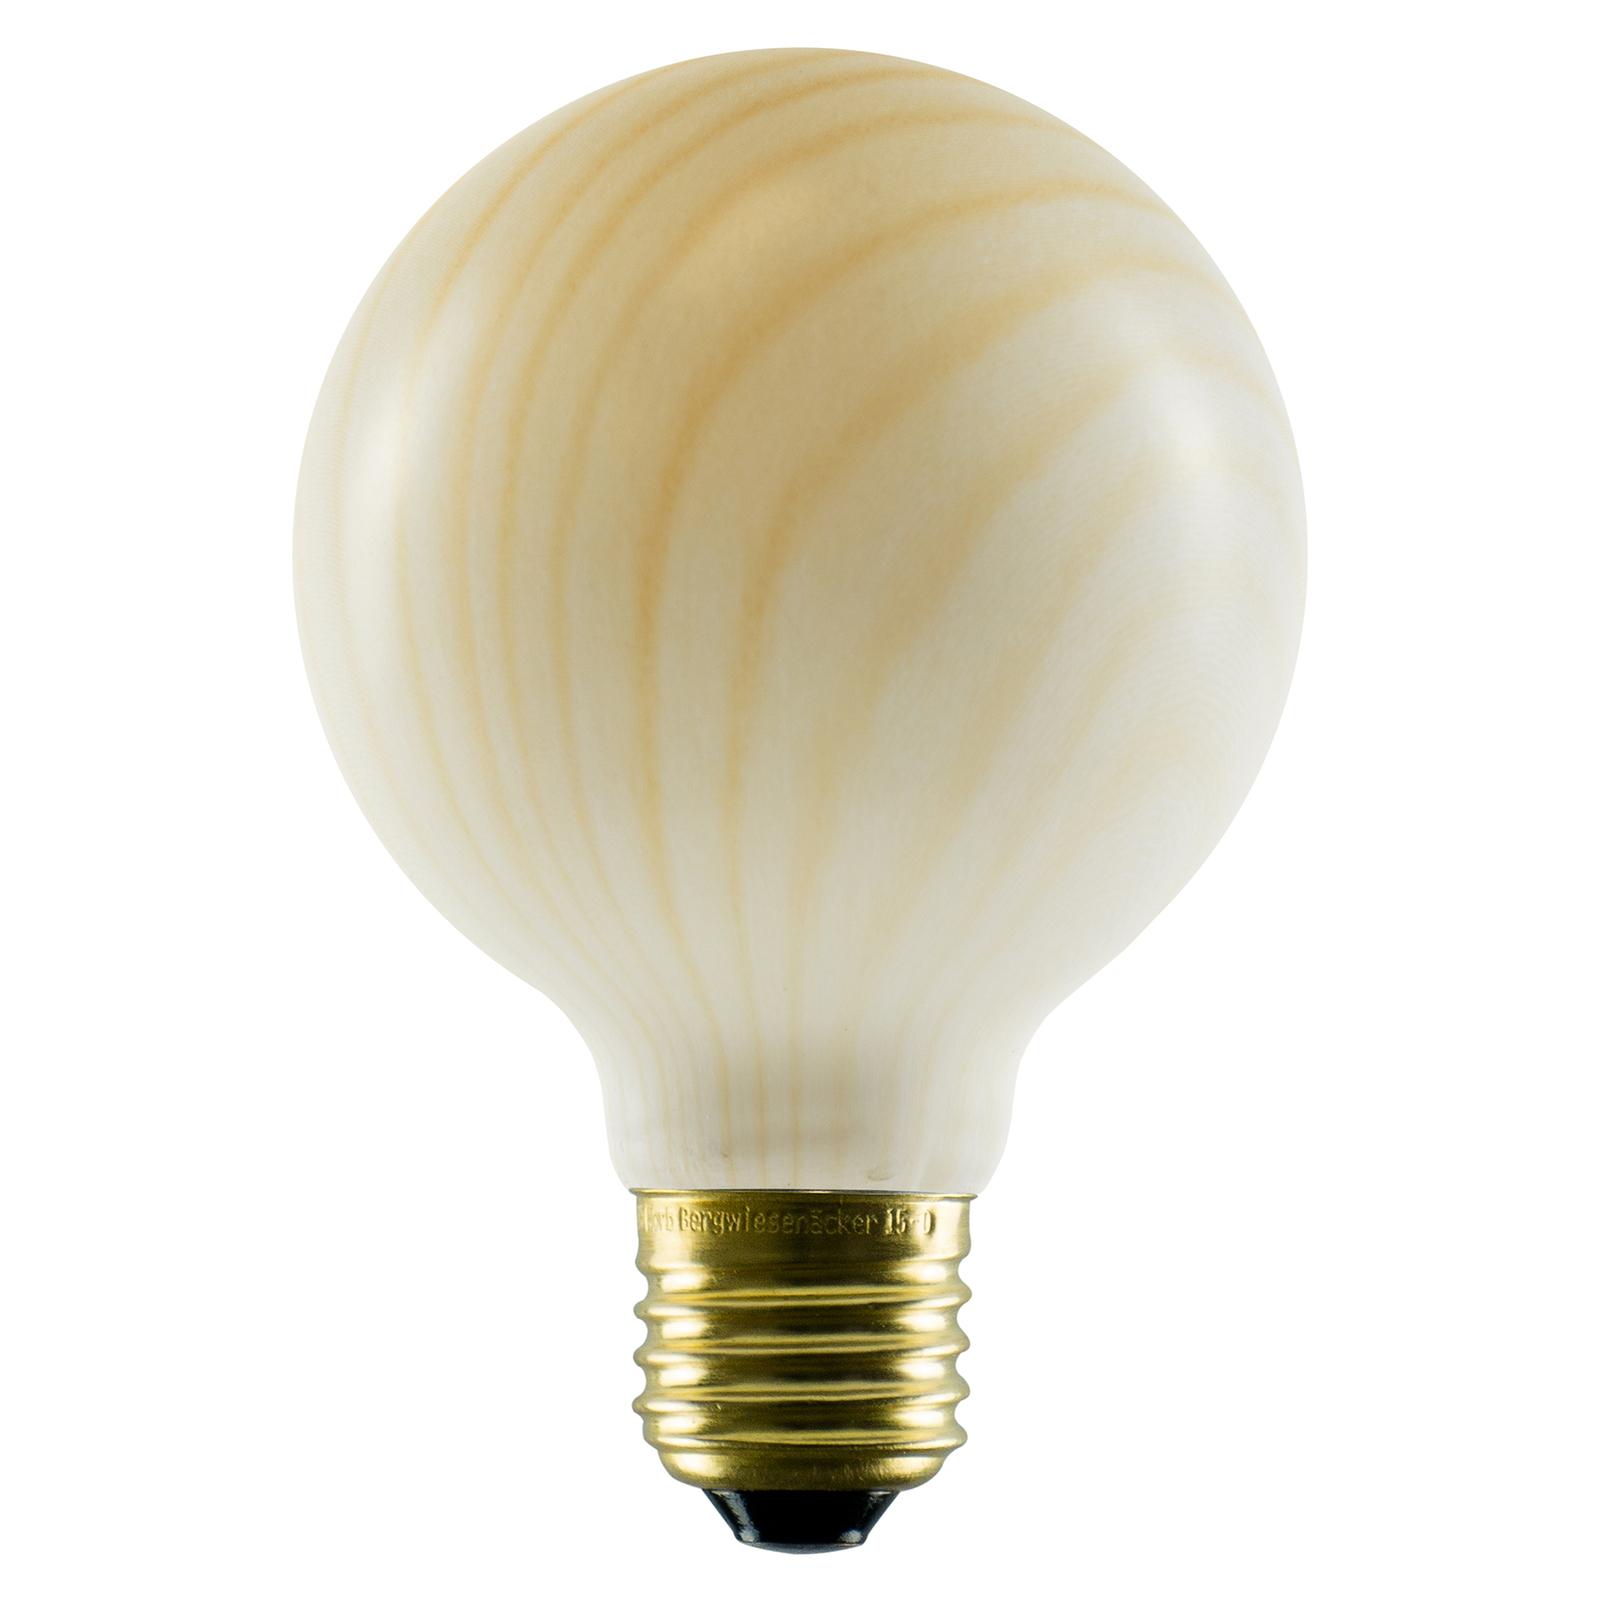 SEGULA LED-globe-lamppu G80 E27 8 W, puujäljitelmä